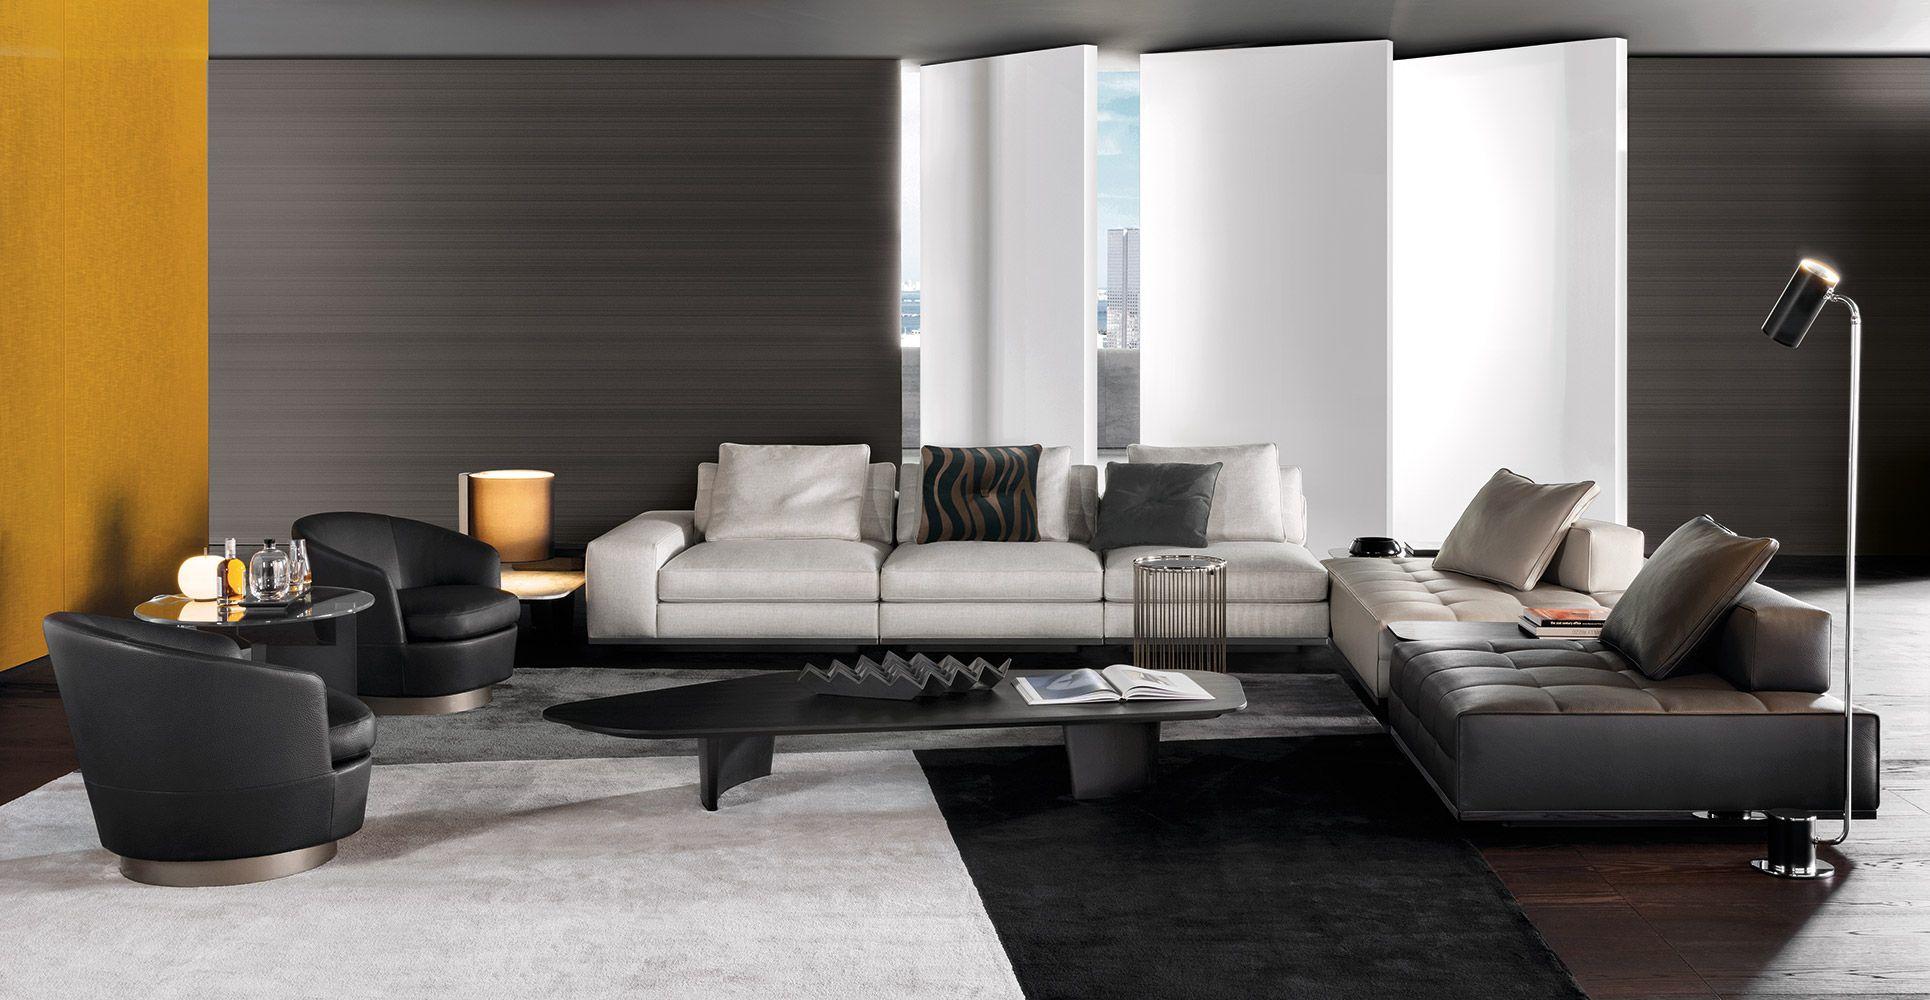 Lawrence Minima Lounge Seating Seating Sofa Design